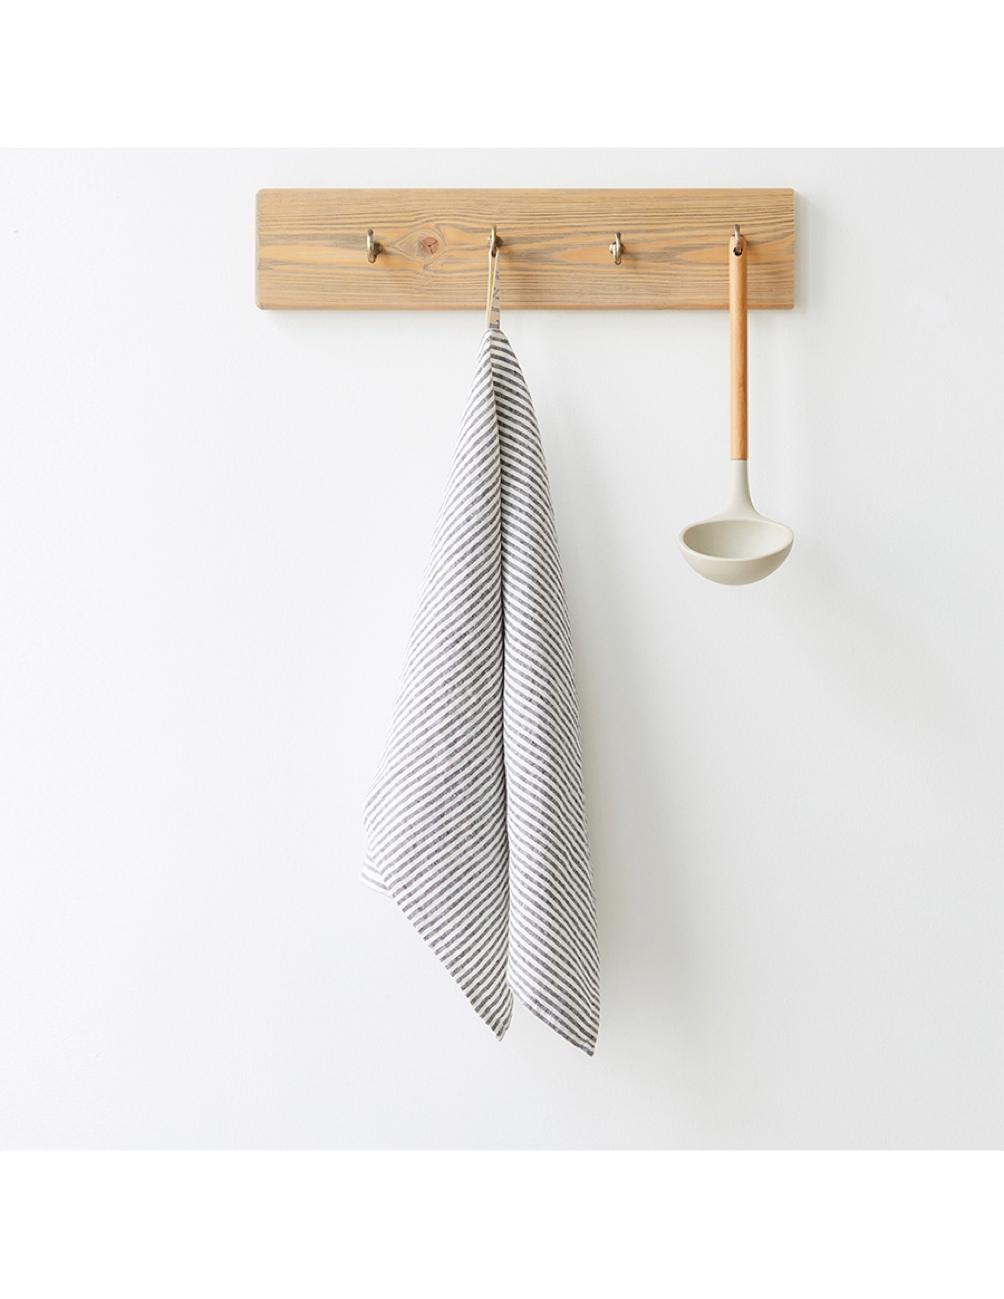 Handmade kitchen towel white black striped linnen